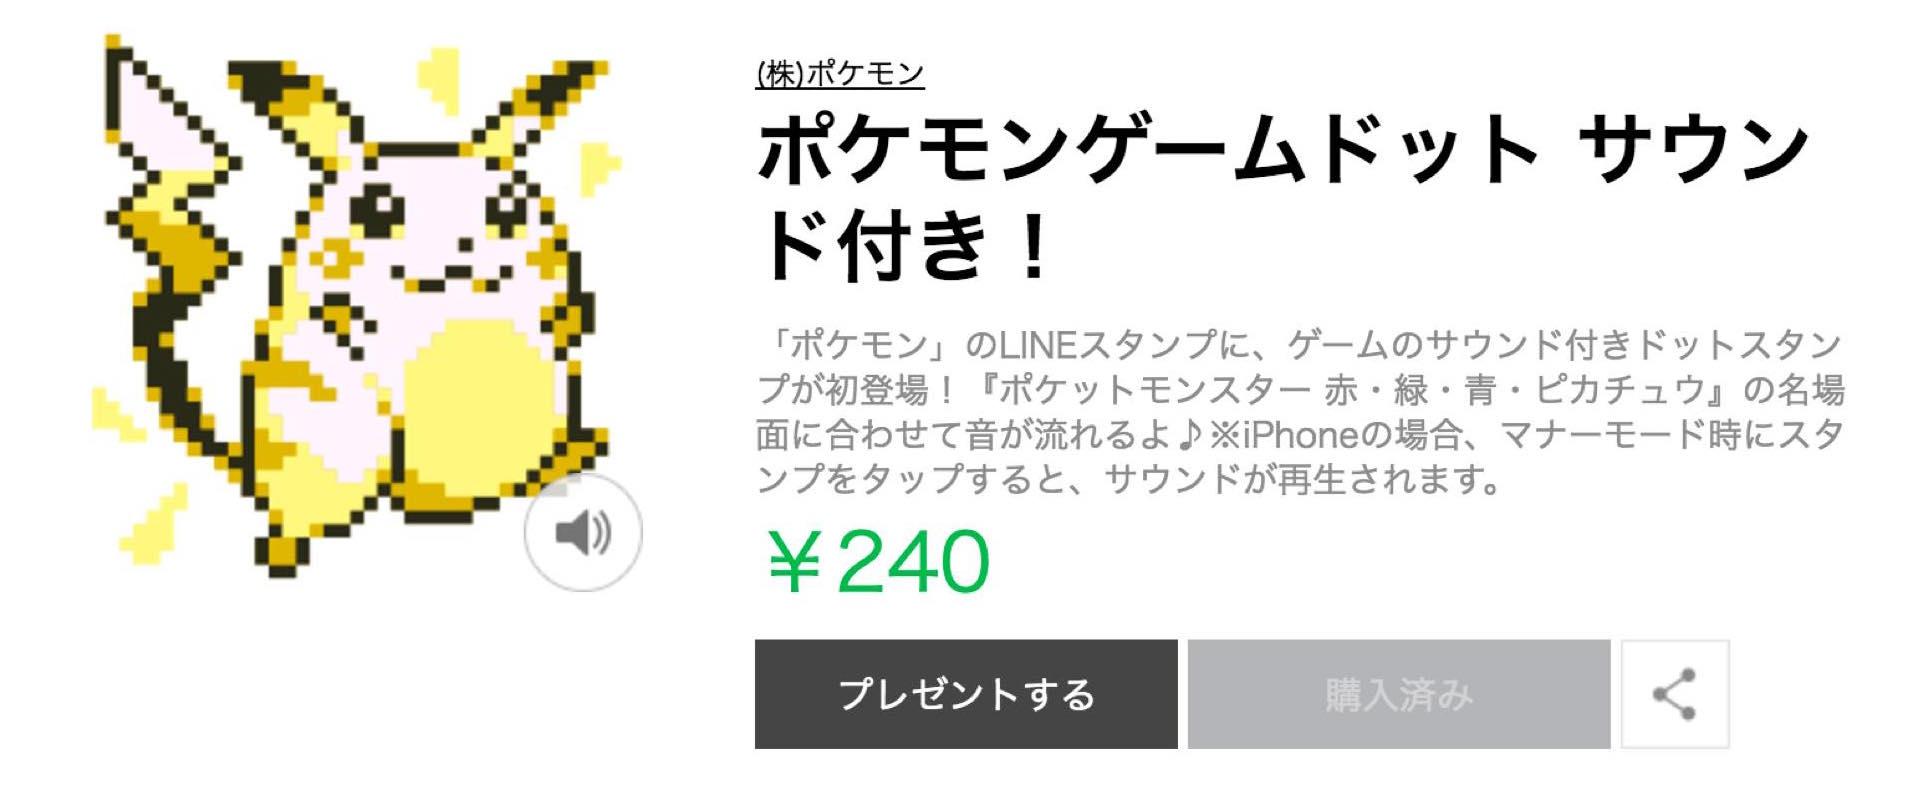 line-pokemon-stamp7